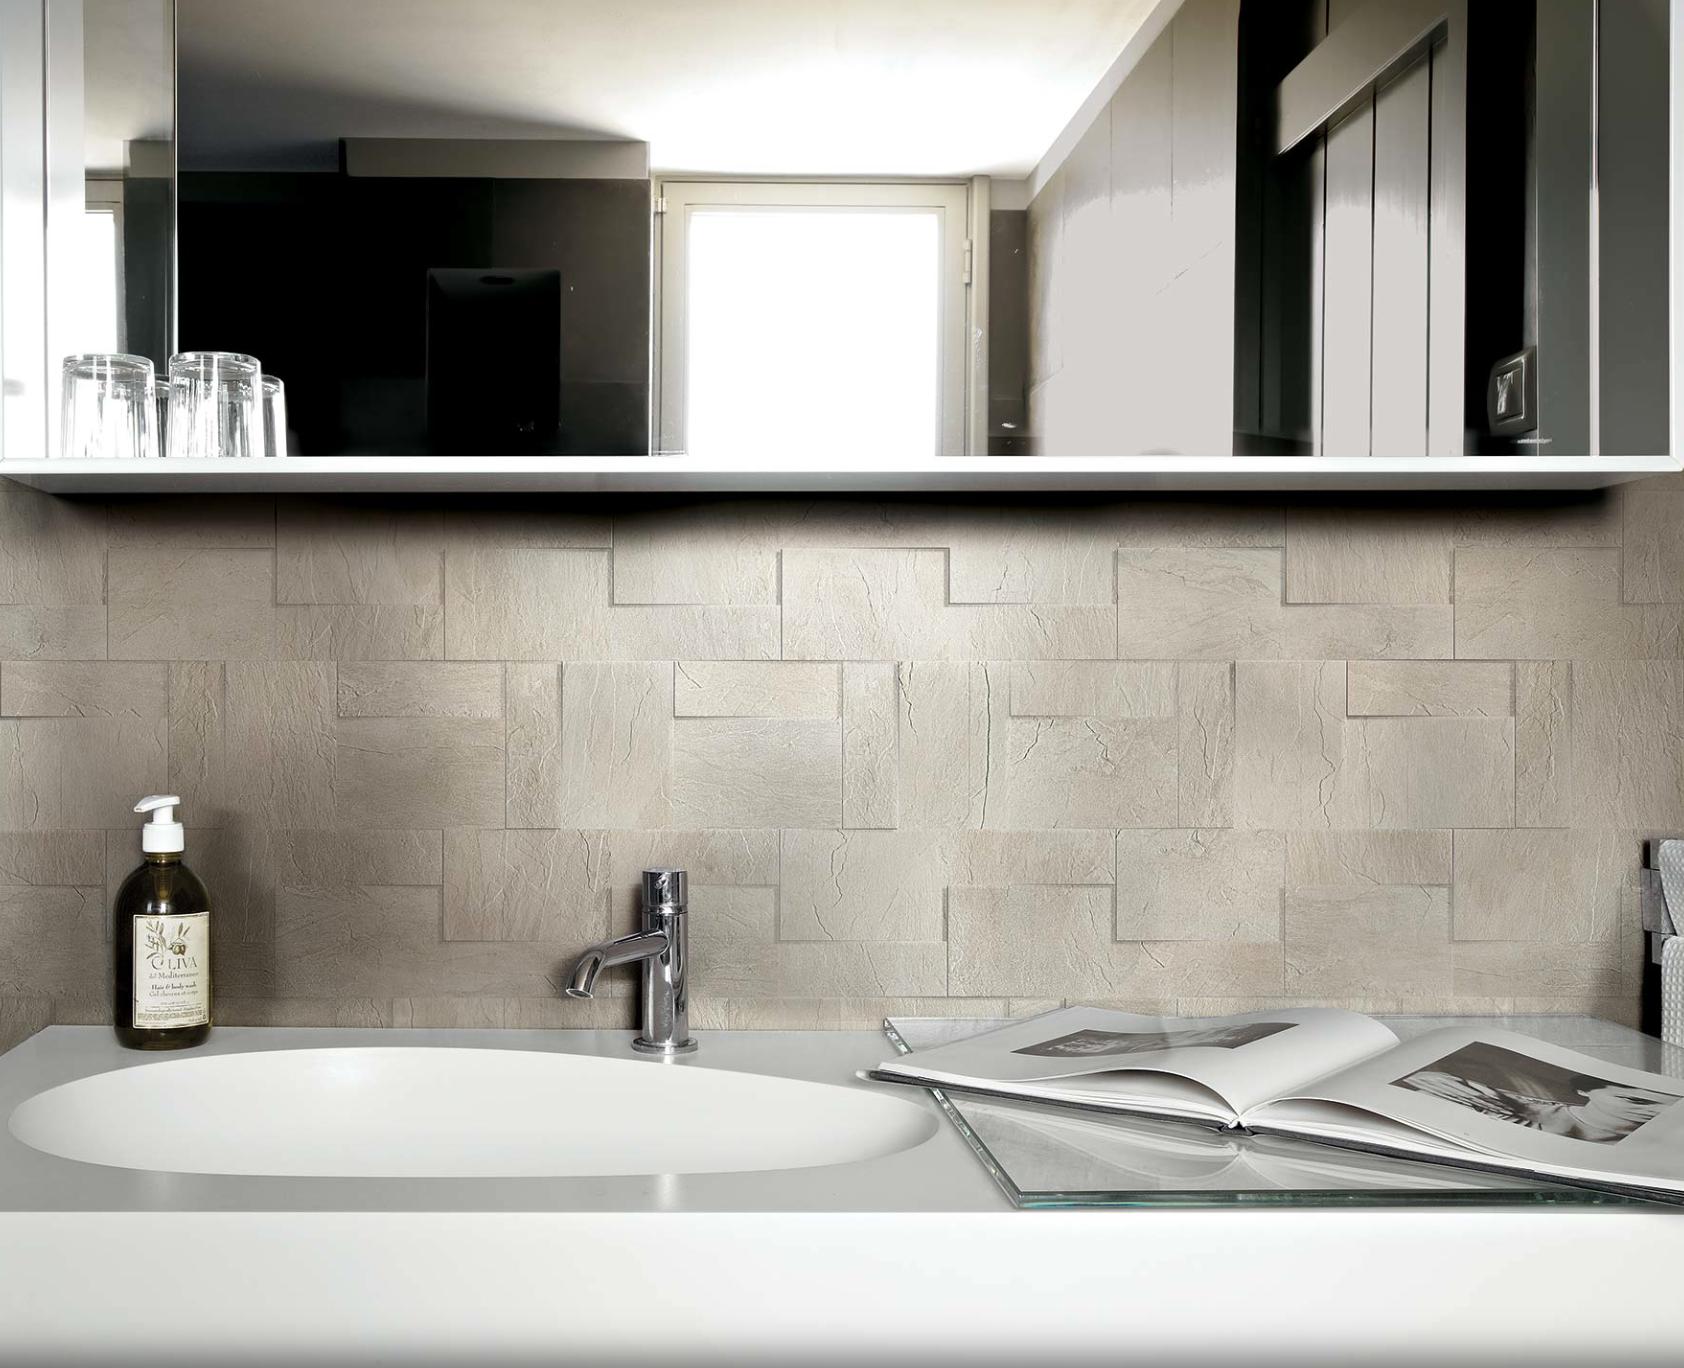 Rex - iClassici Ivorie matte modulo muretto 30x30 | Bathrooms ...